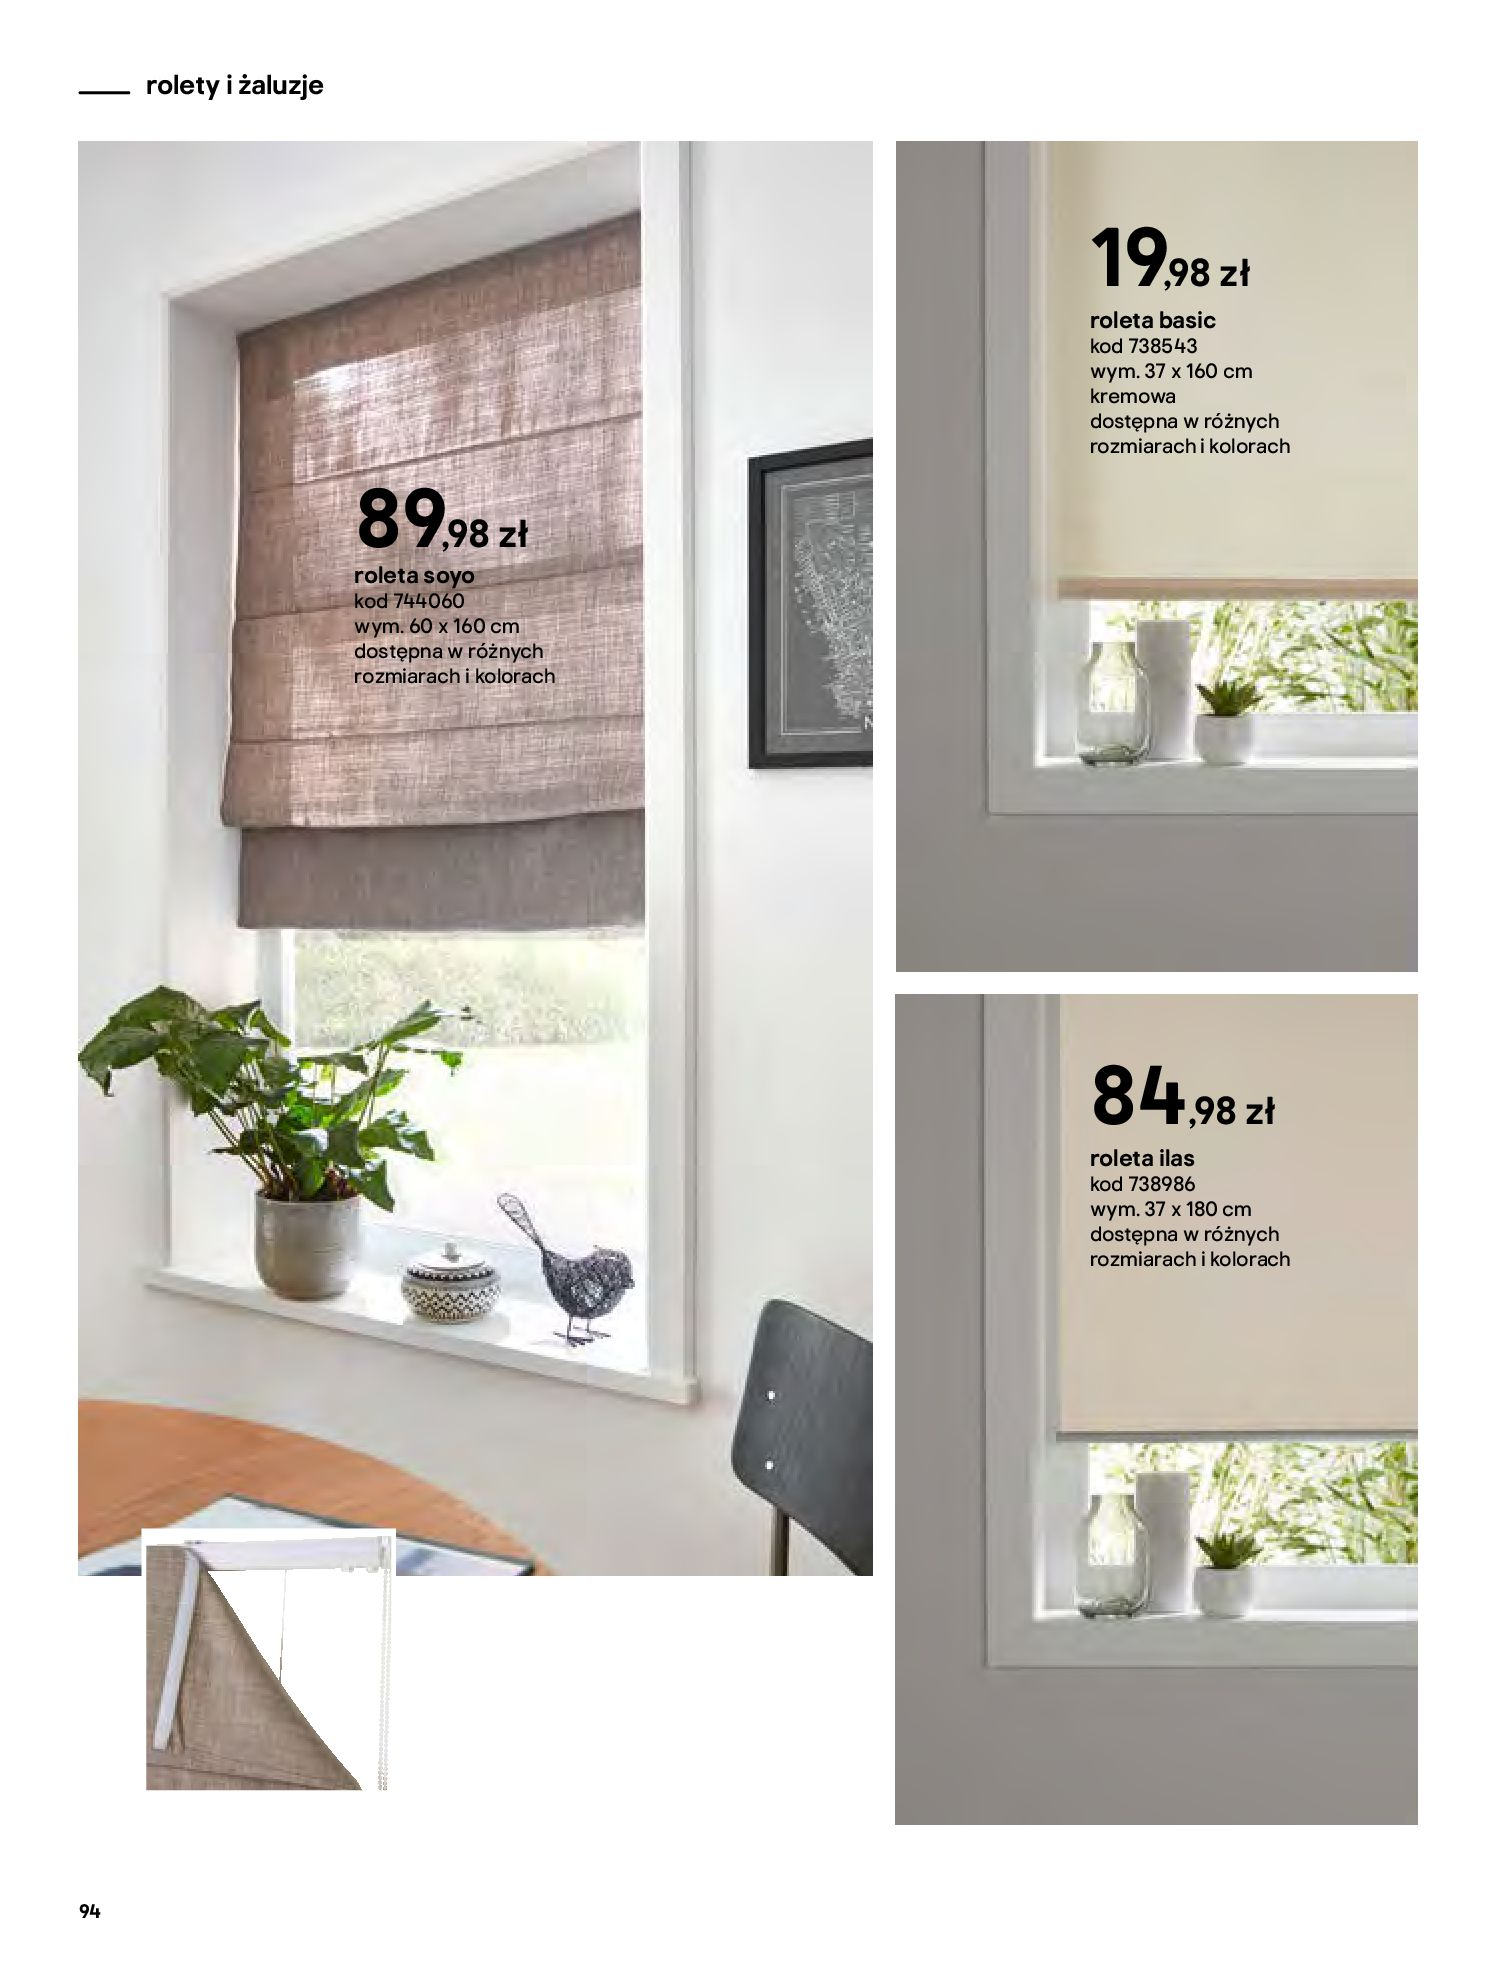 Gazetka Castorama - Katalog Dekoracje-22.10.2020-31.12.2020-page-94